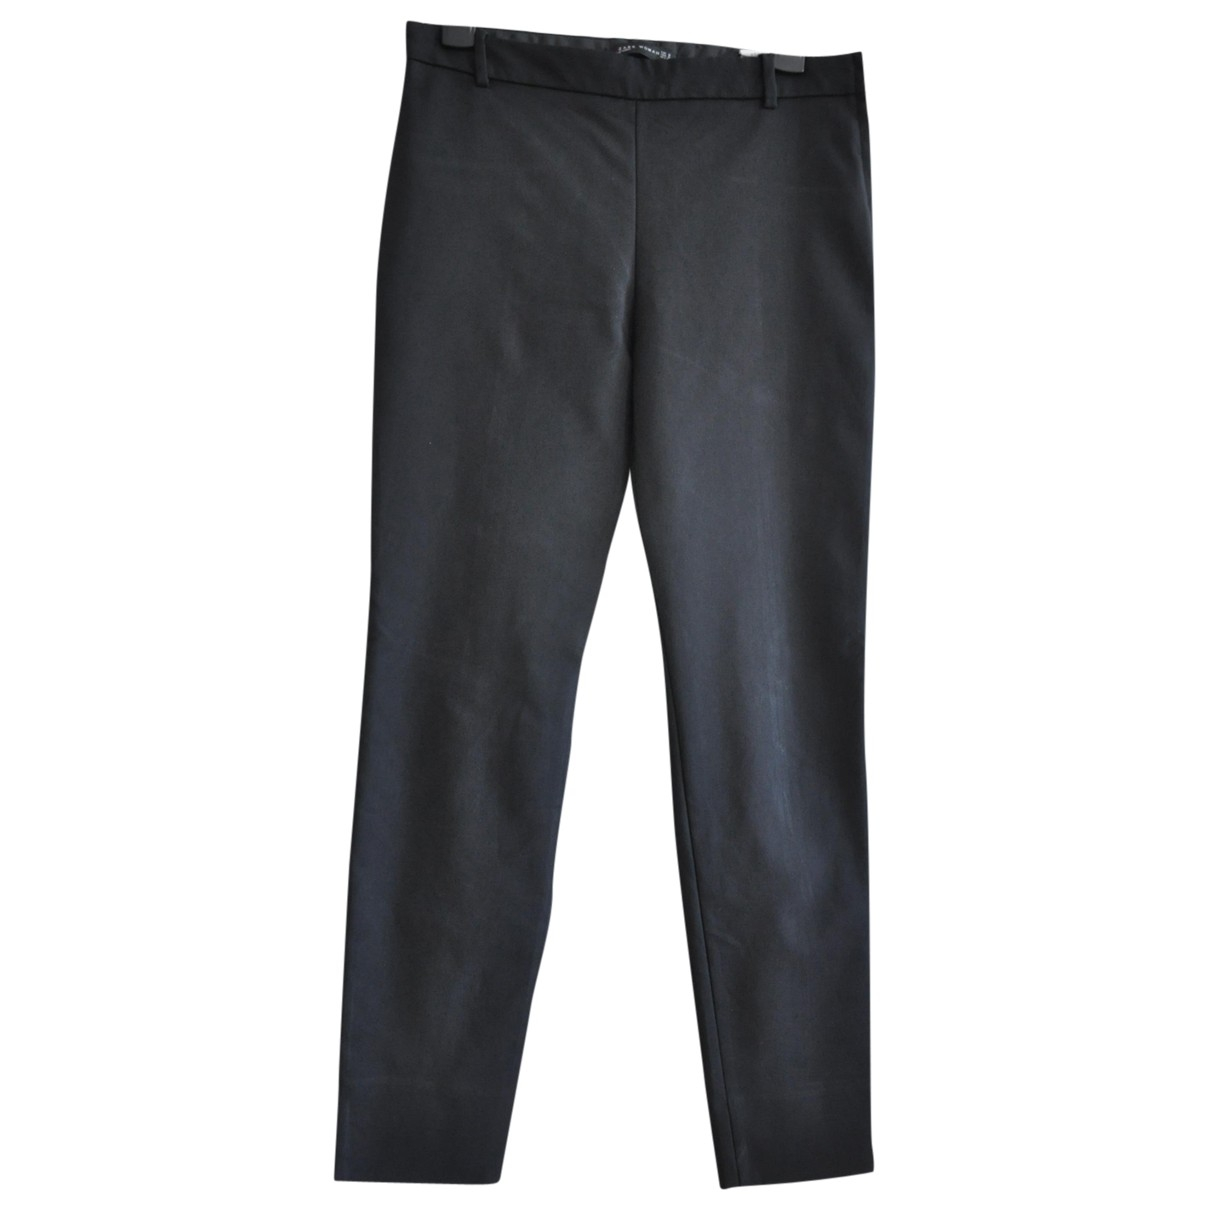 Zara \N Black Cotton Trousers for Women M International